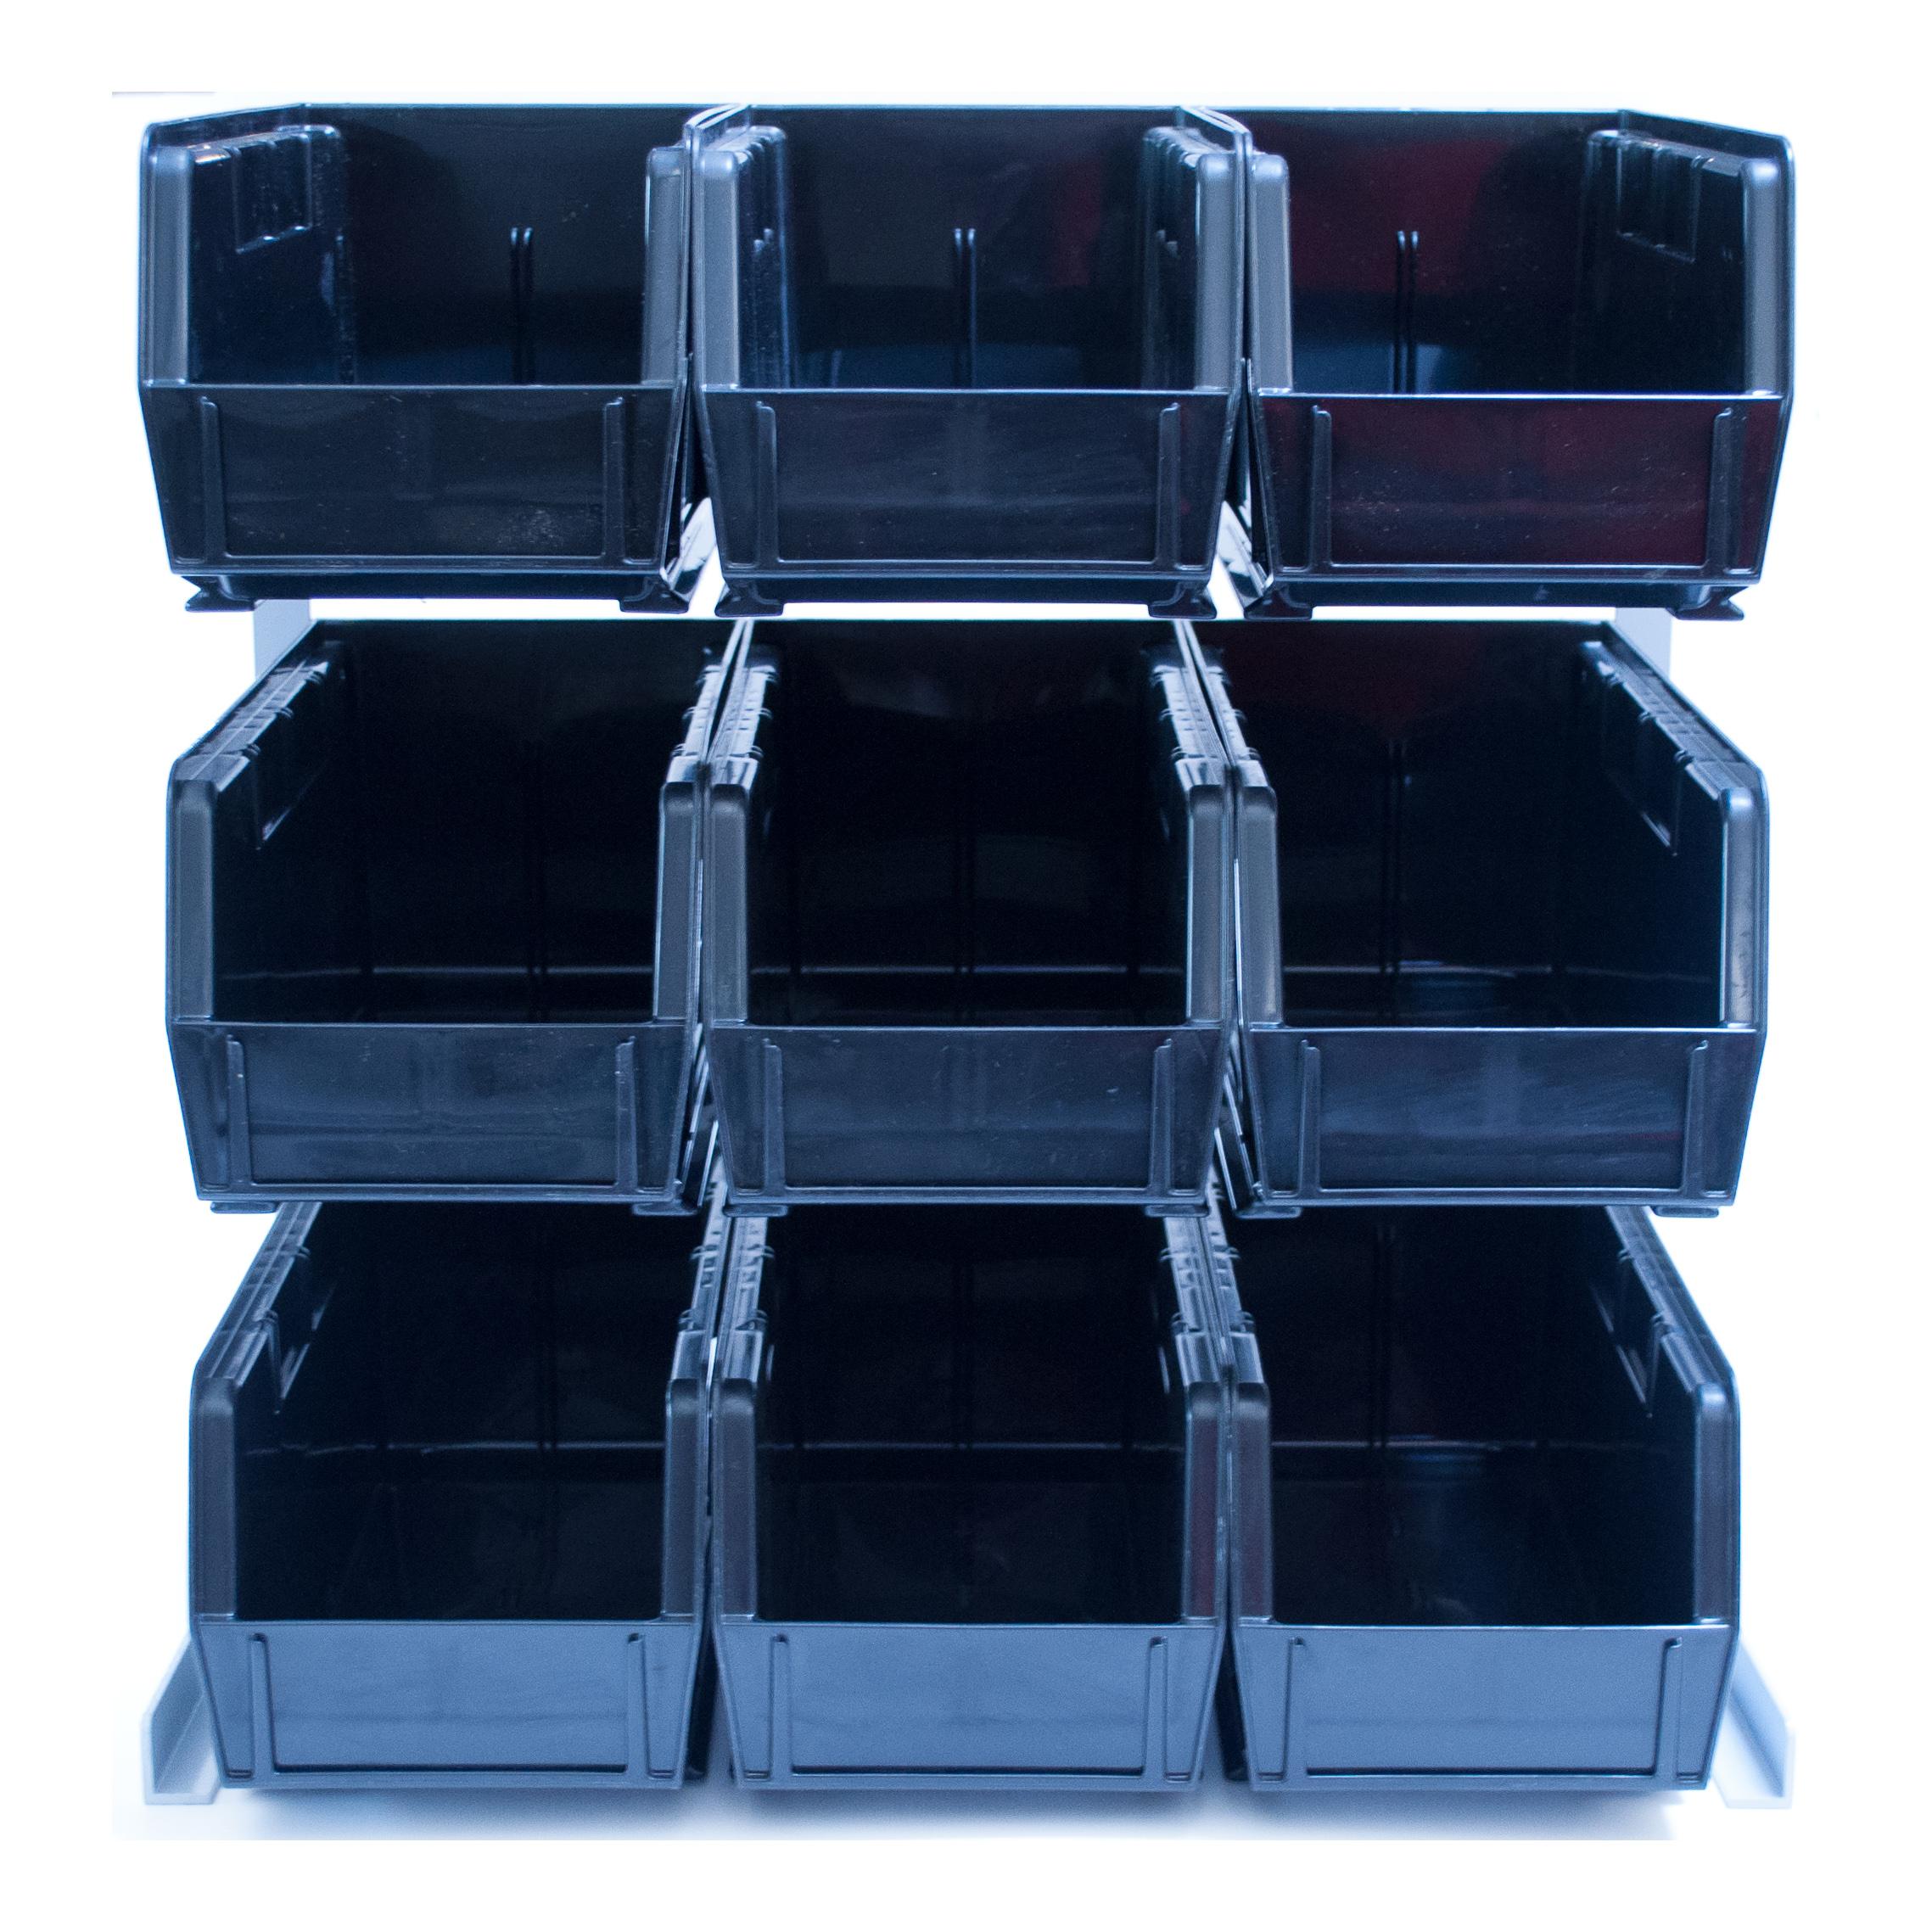 Carlisle 381109LG condiment organizer bin rack